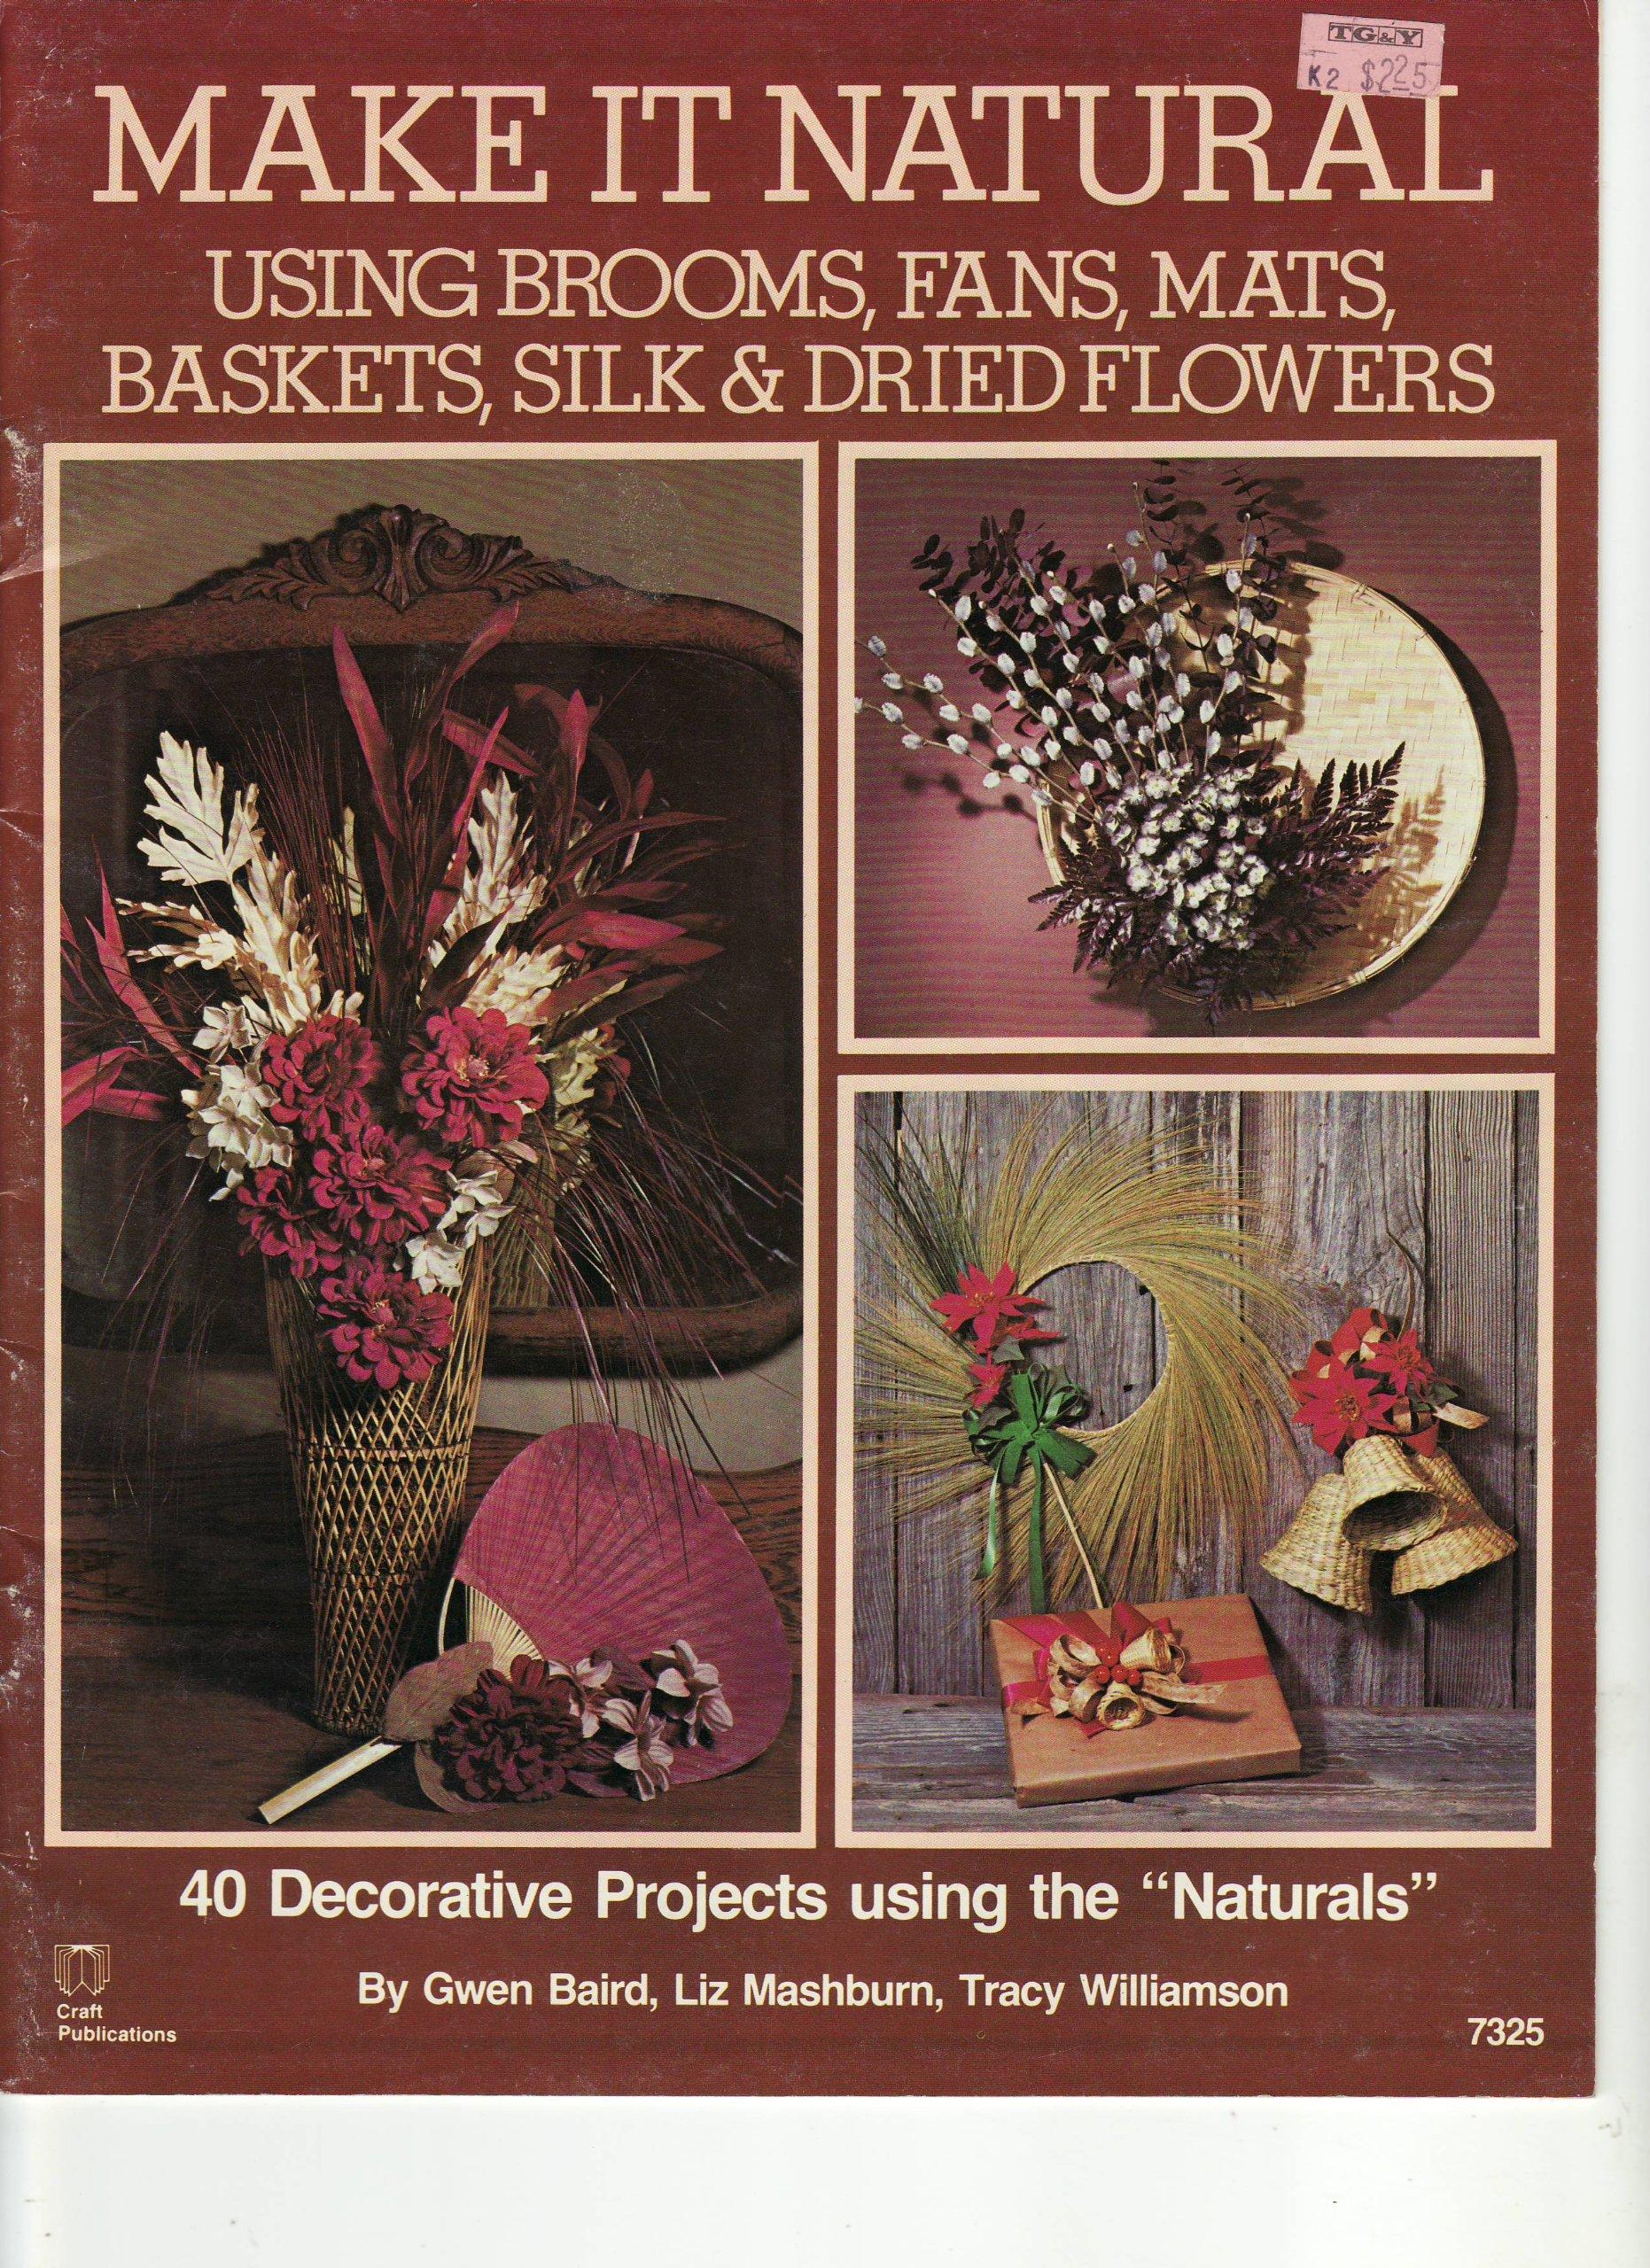 Make it Natural: Using Brooms, Fans, Mats, Baskets, Silk & Dried Flowers (#7325)